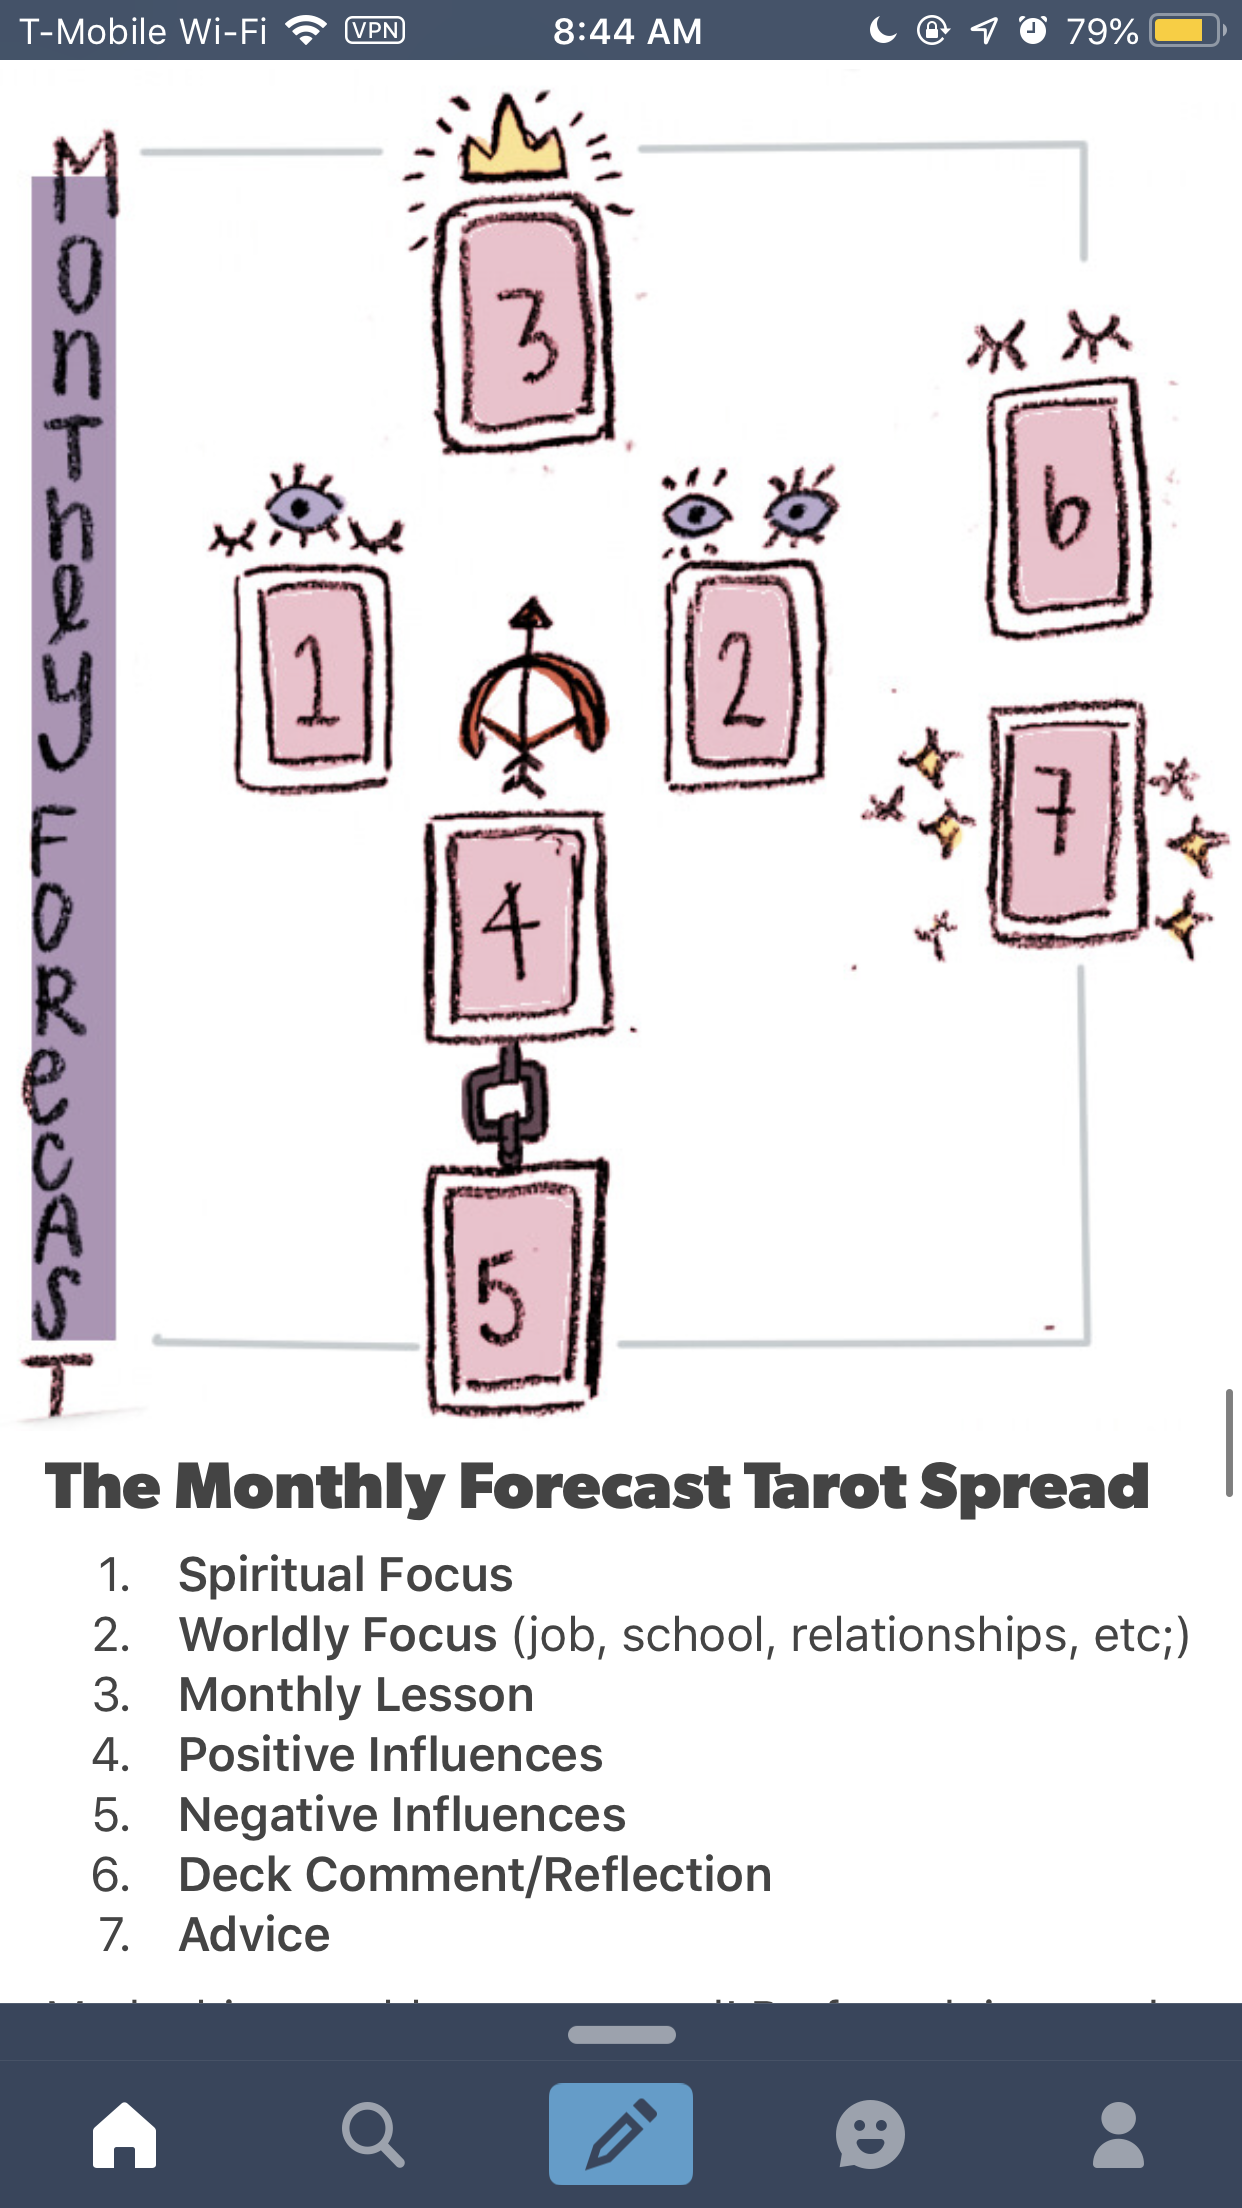 Pin by Leah Primeaux on Magick | Tarot spreads, Tarot, Tarot